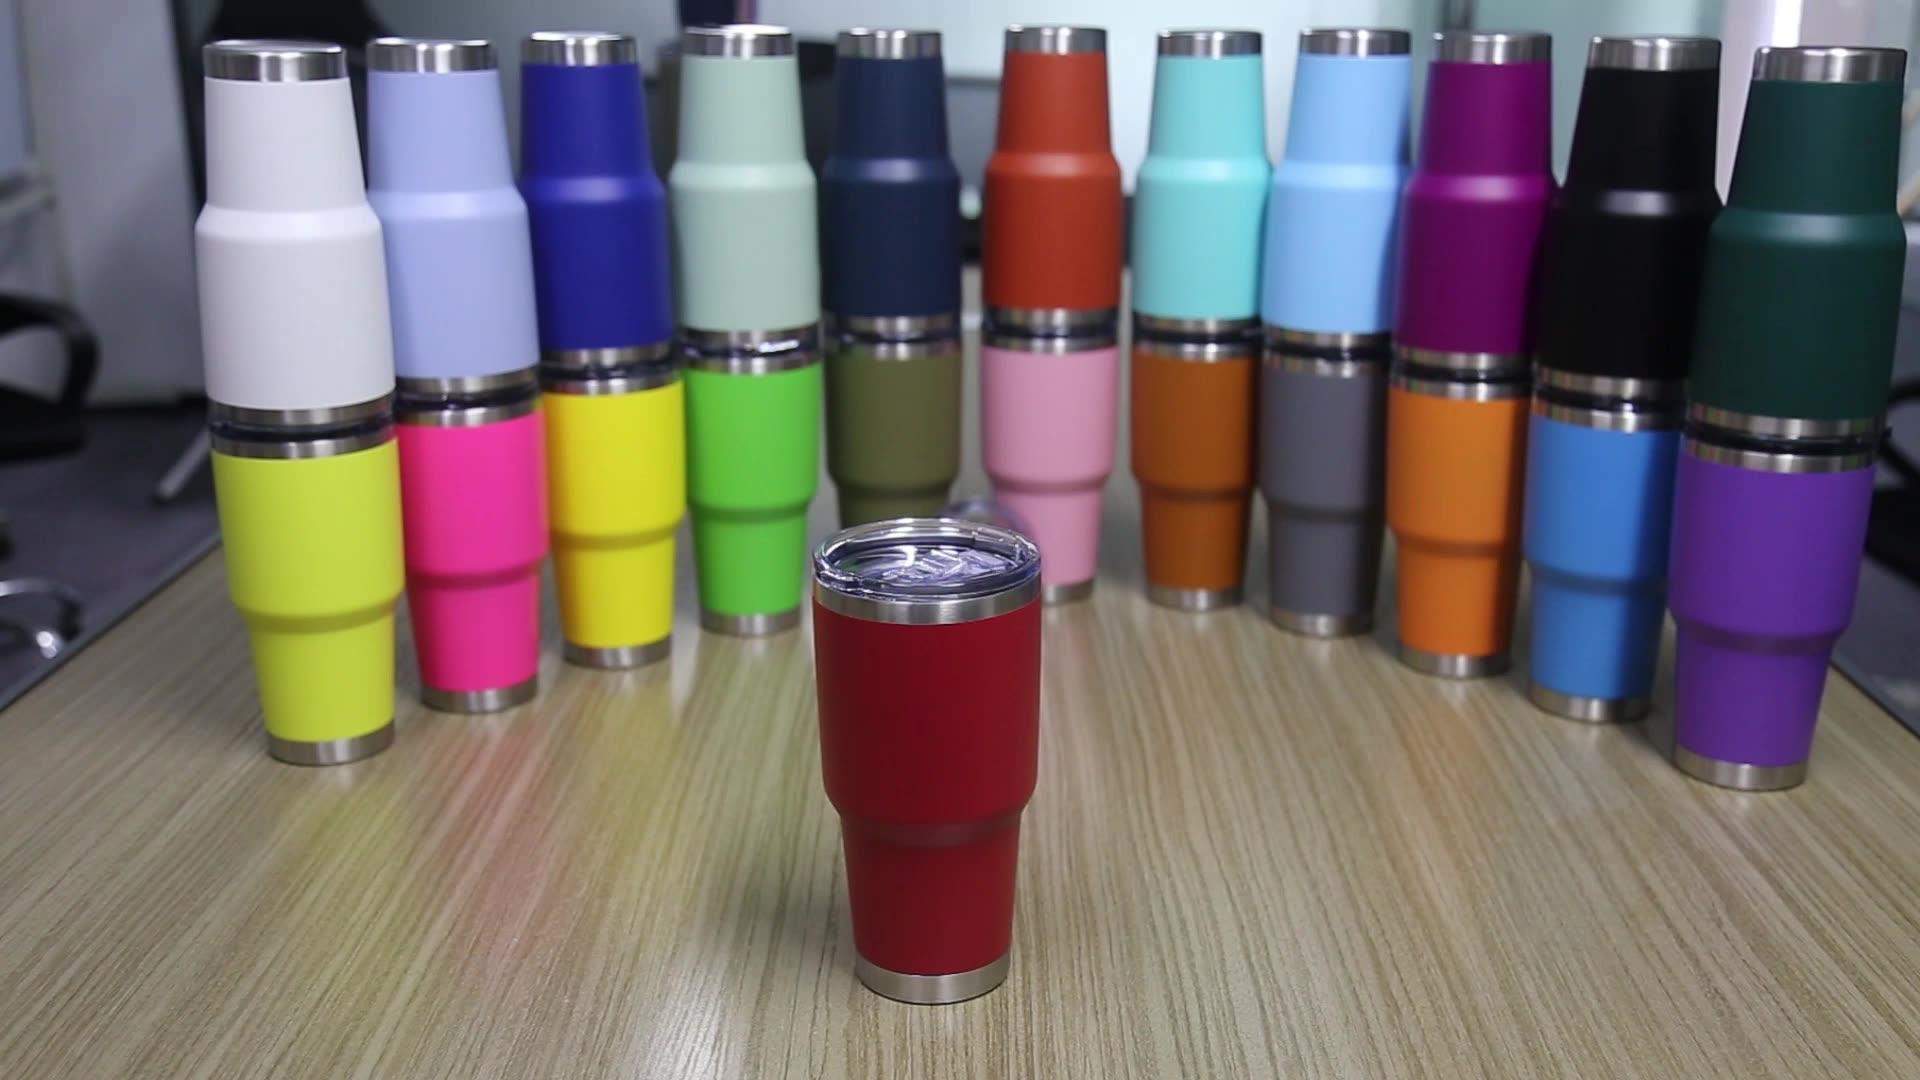 30oz נירוסטה כוס ואקום מבודד כפול קיר נסיעות רכב רגיל גליטר רגיל כוס כוסות